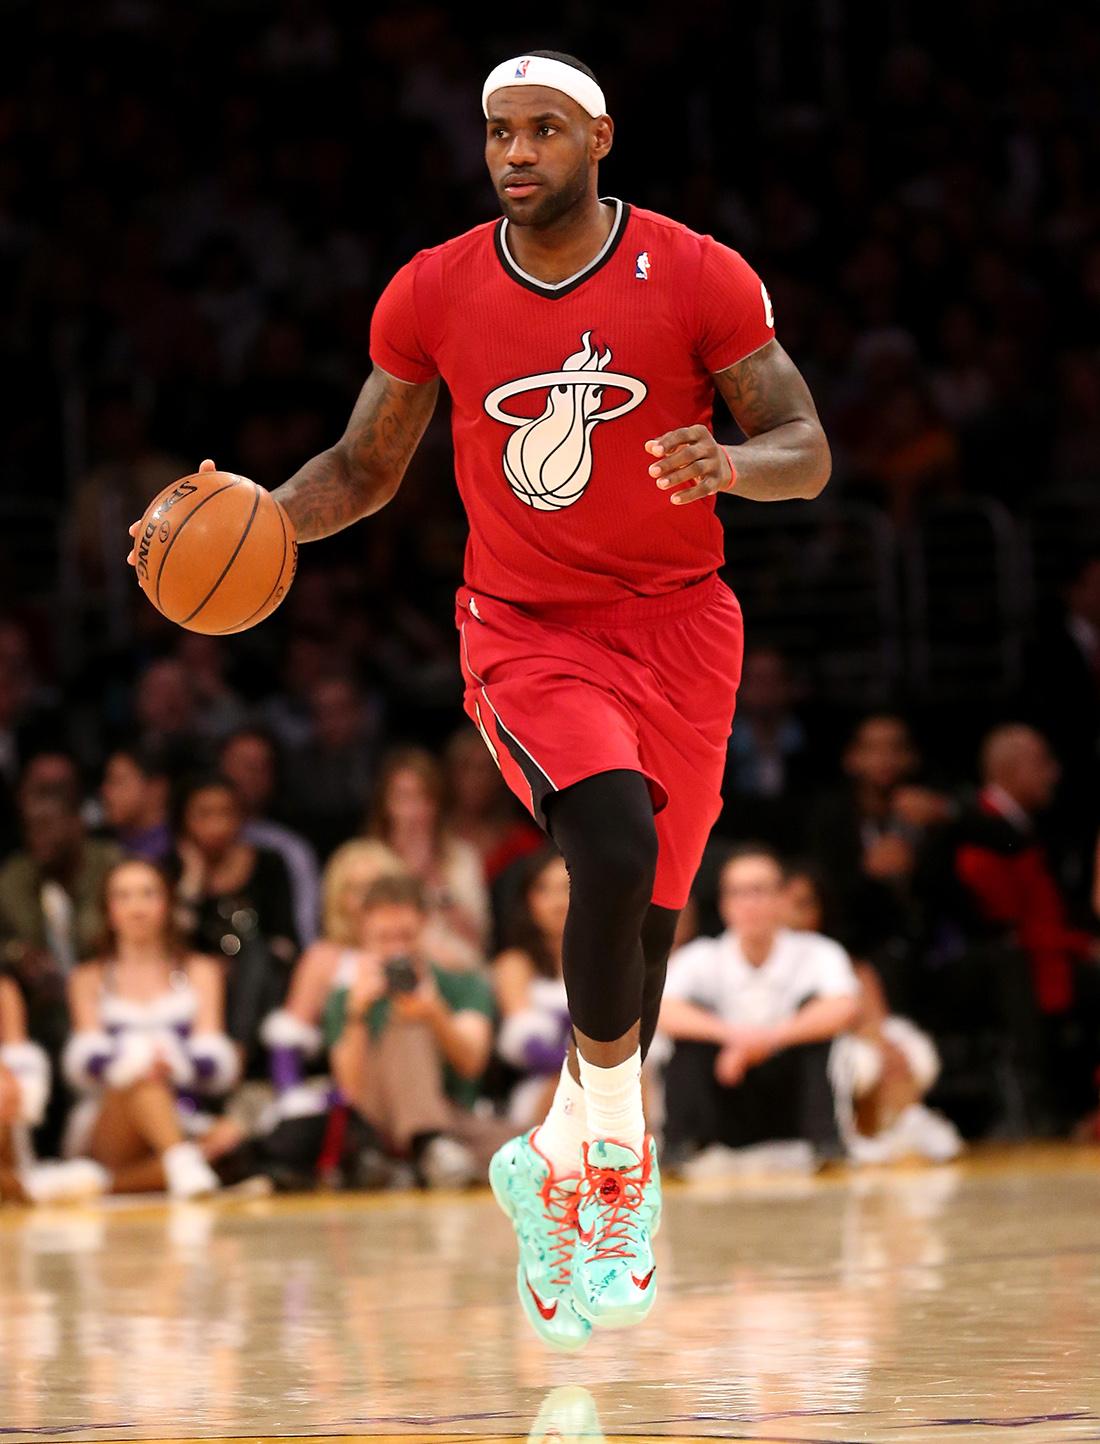 lebron james de Miami Heat v Los Angeles Lakers en viva basquet